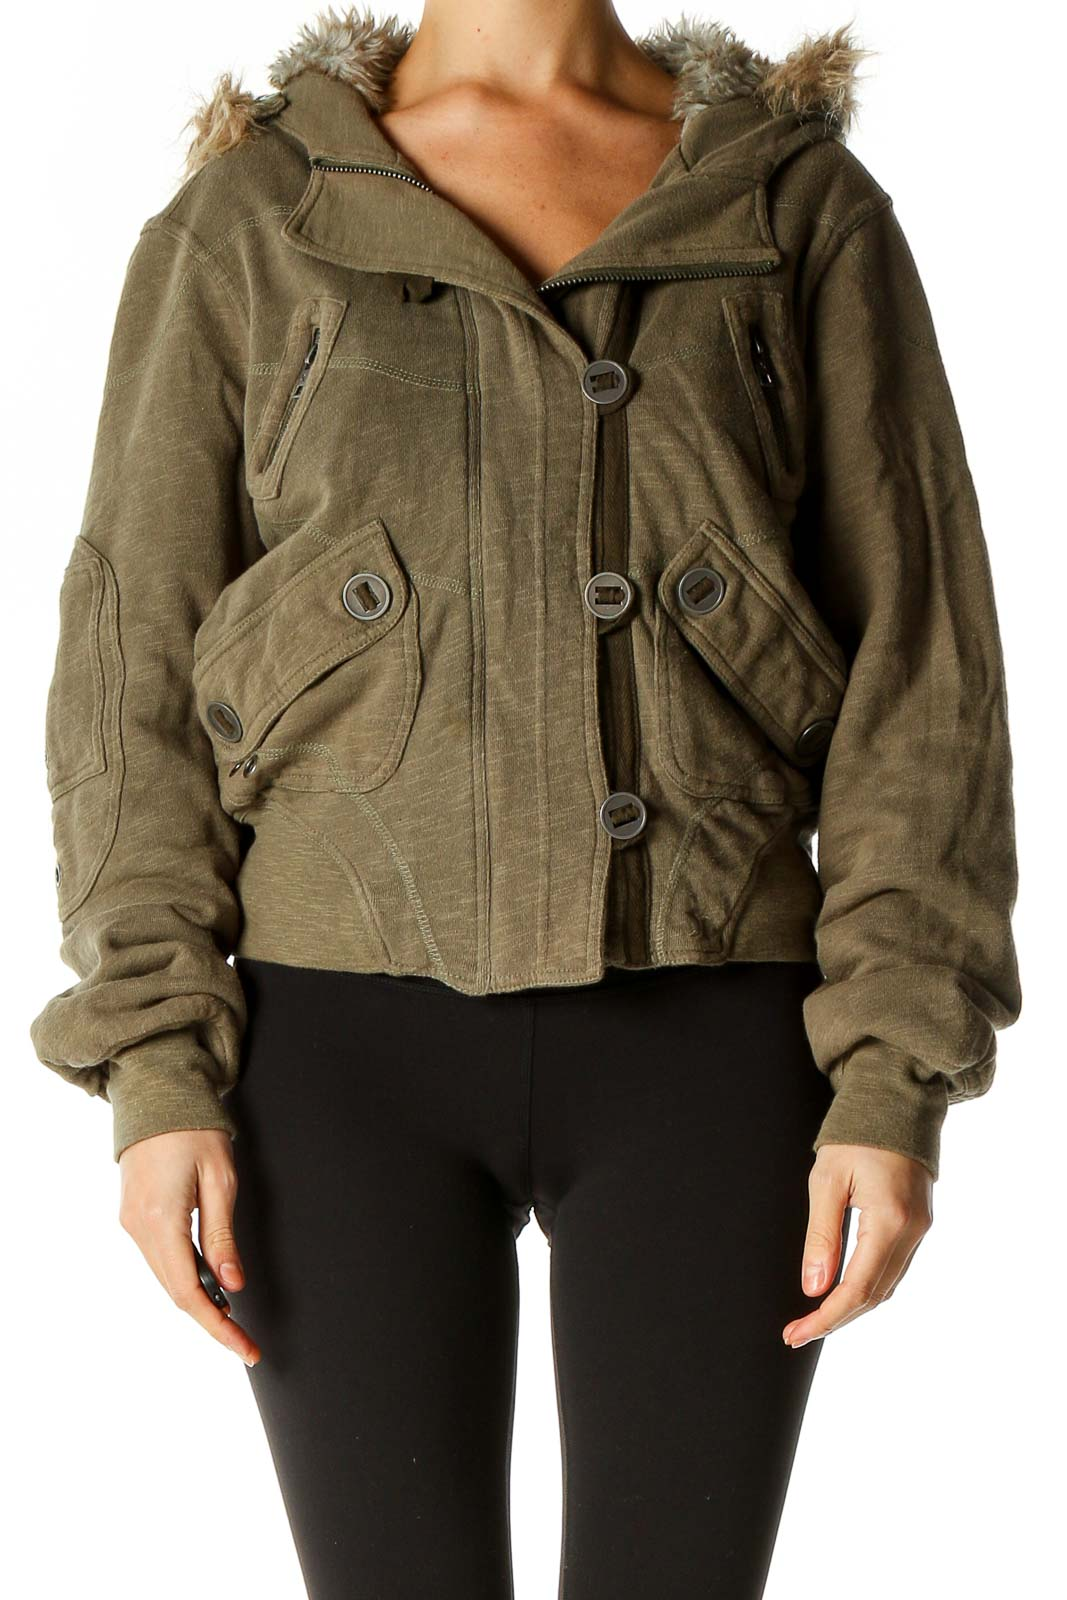 Green Shearling Jacket Front